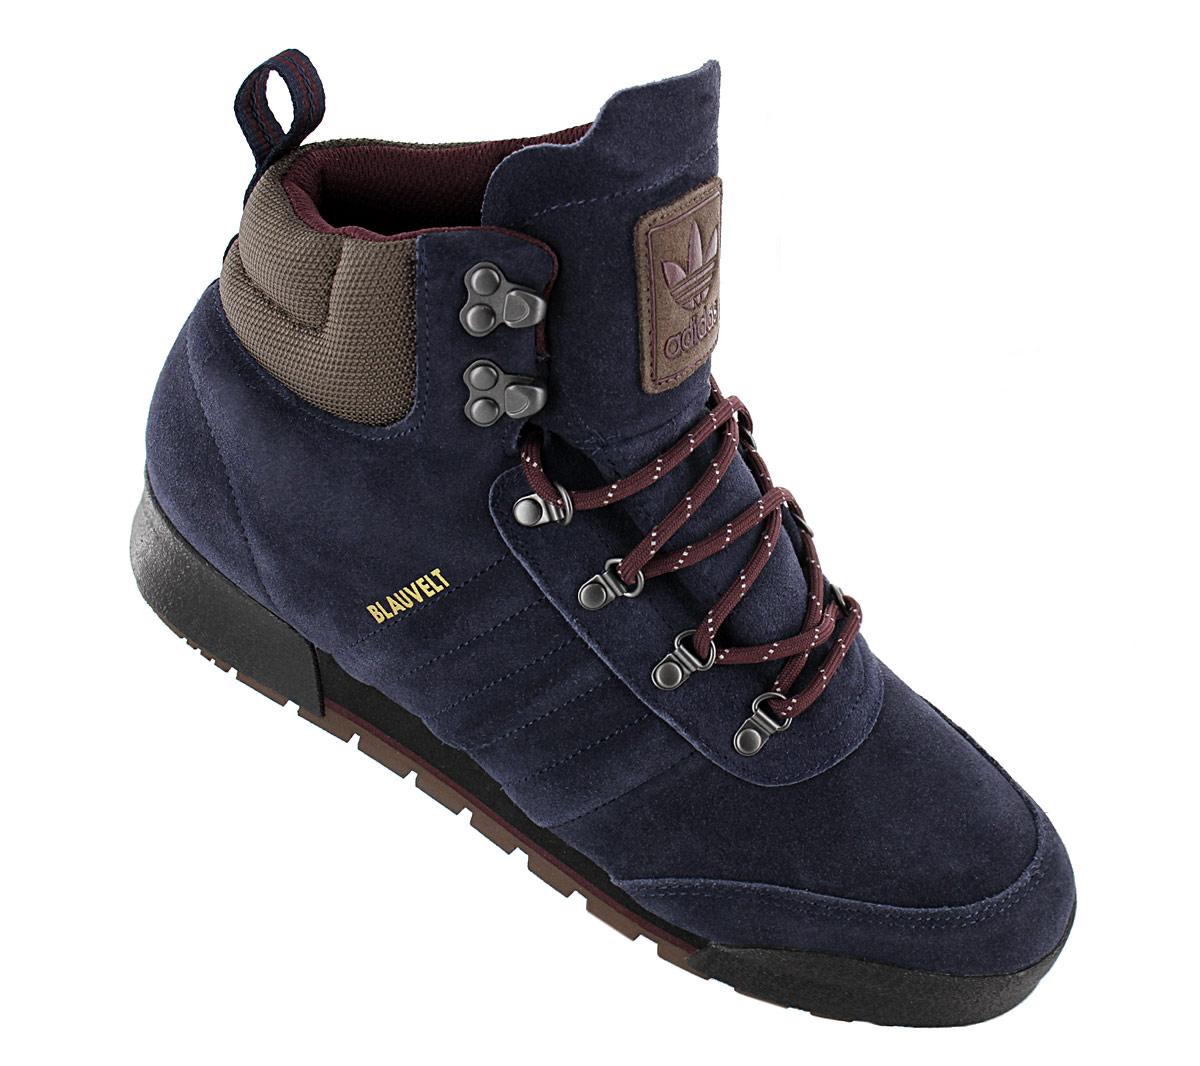 Details about Adidas Jake Blauvelt Boot 2.0 Men's Boots EE6207 Blue Sneaker Shoe Sneaker